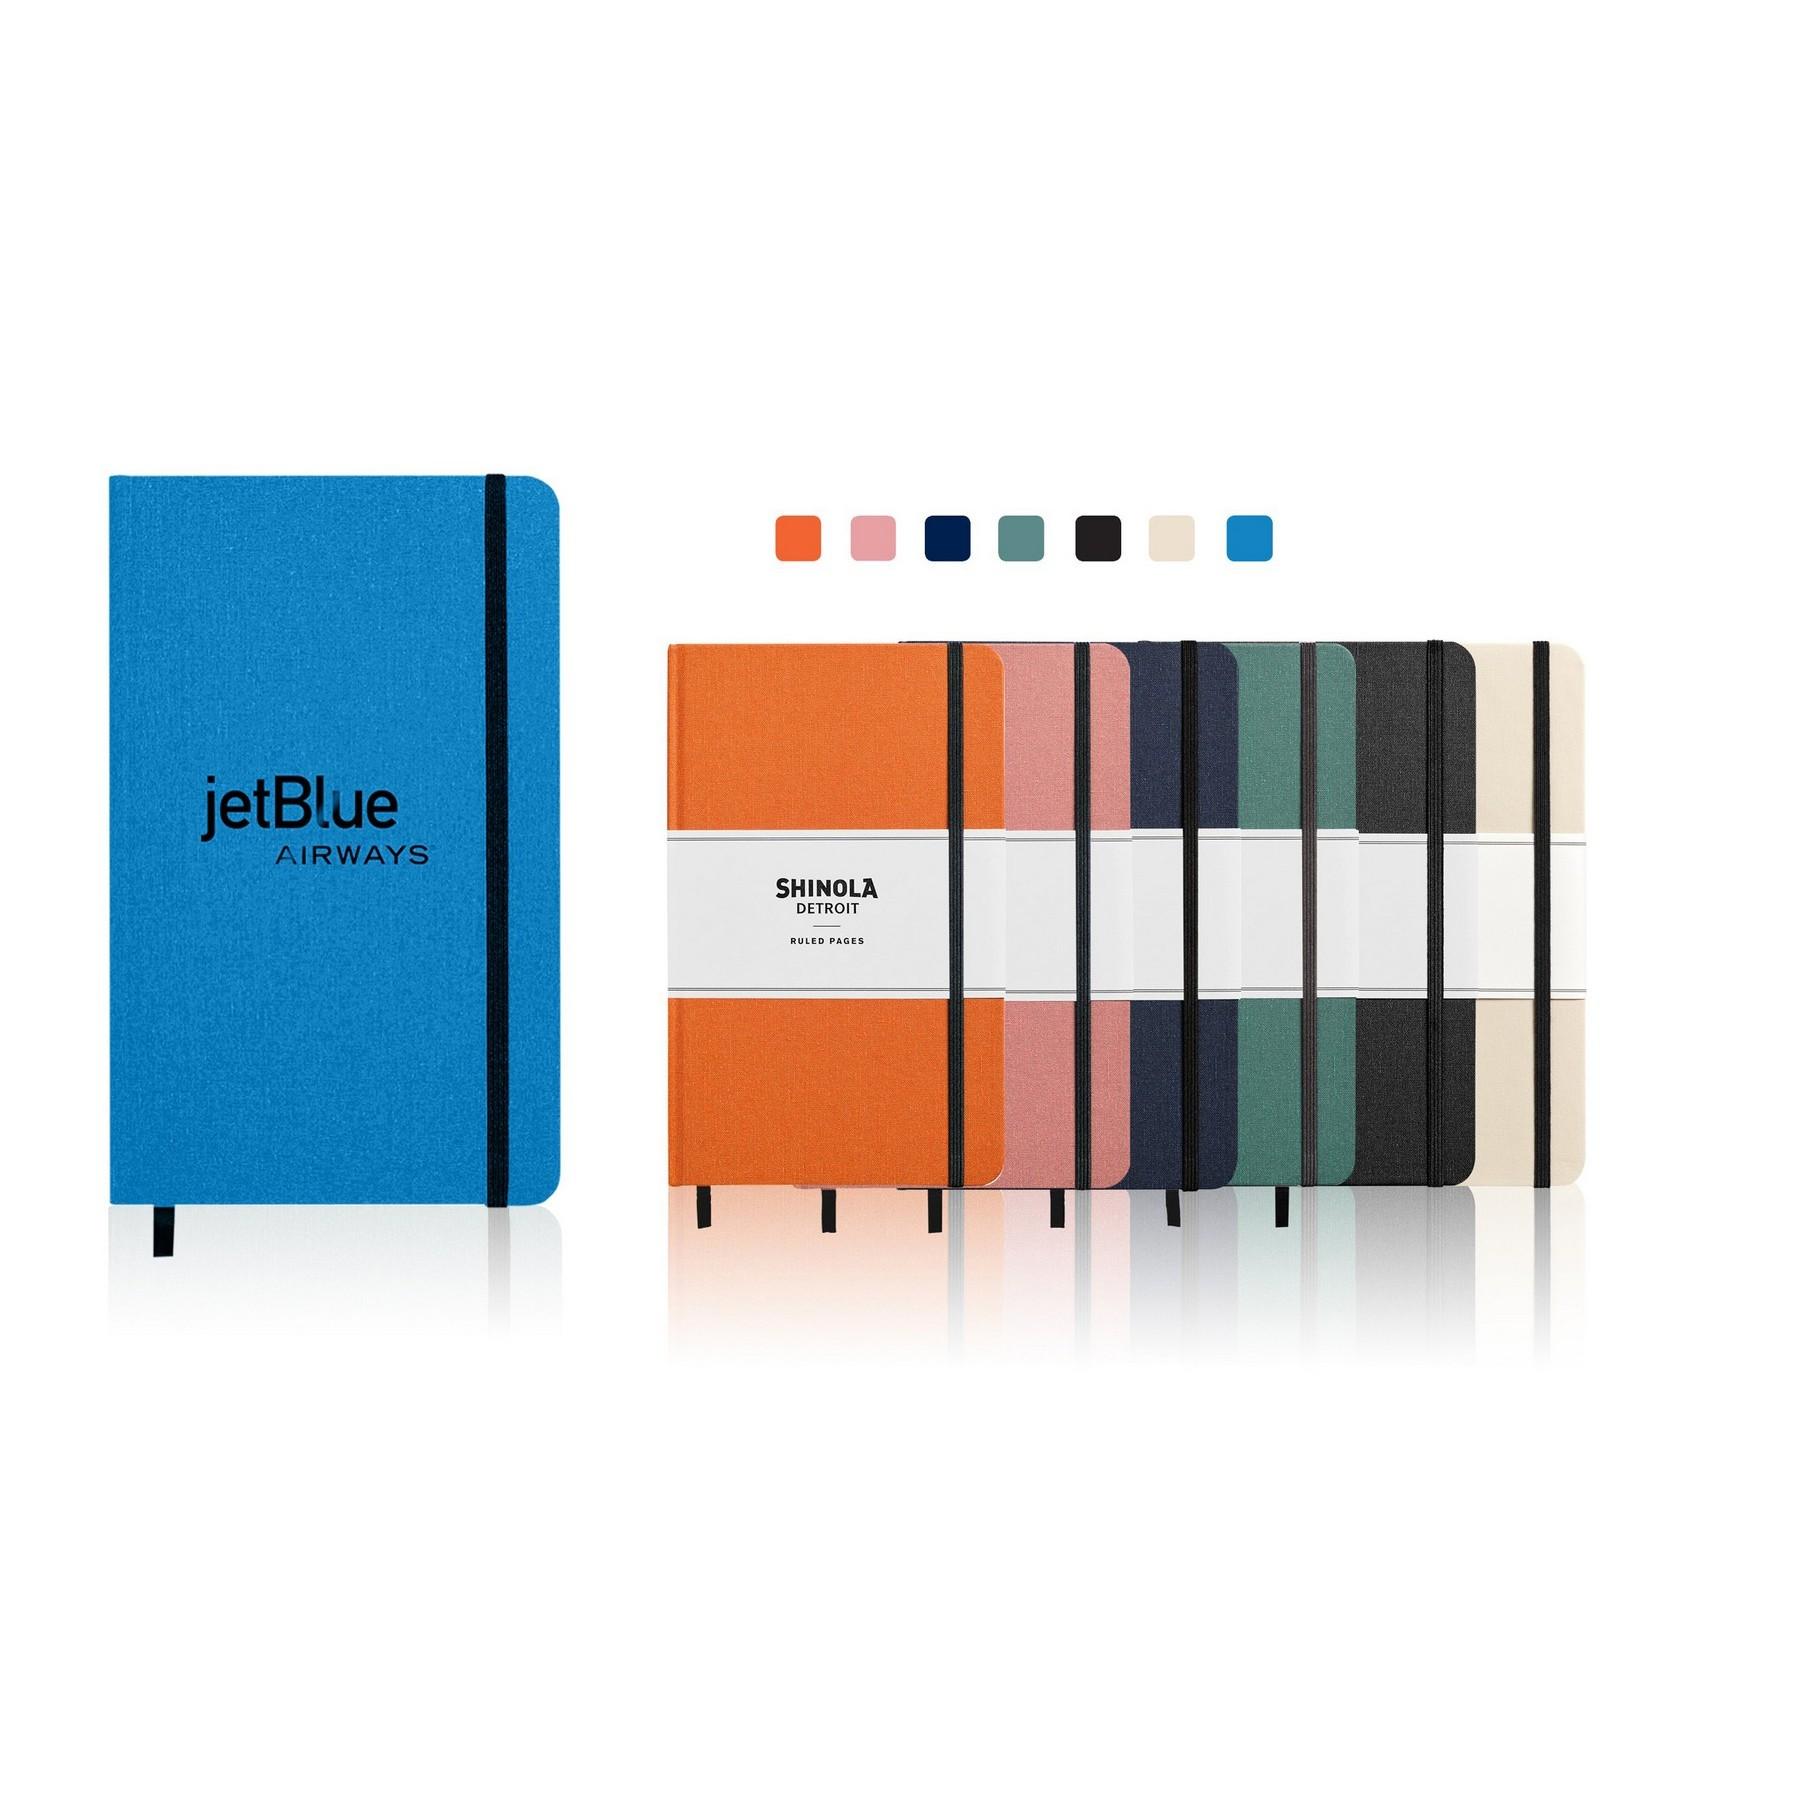 Shinola Linen Hardcover Journal - Medium